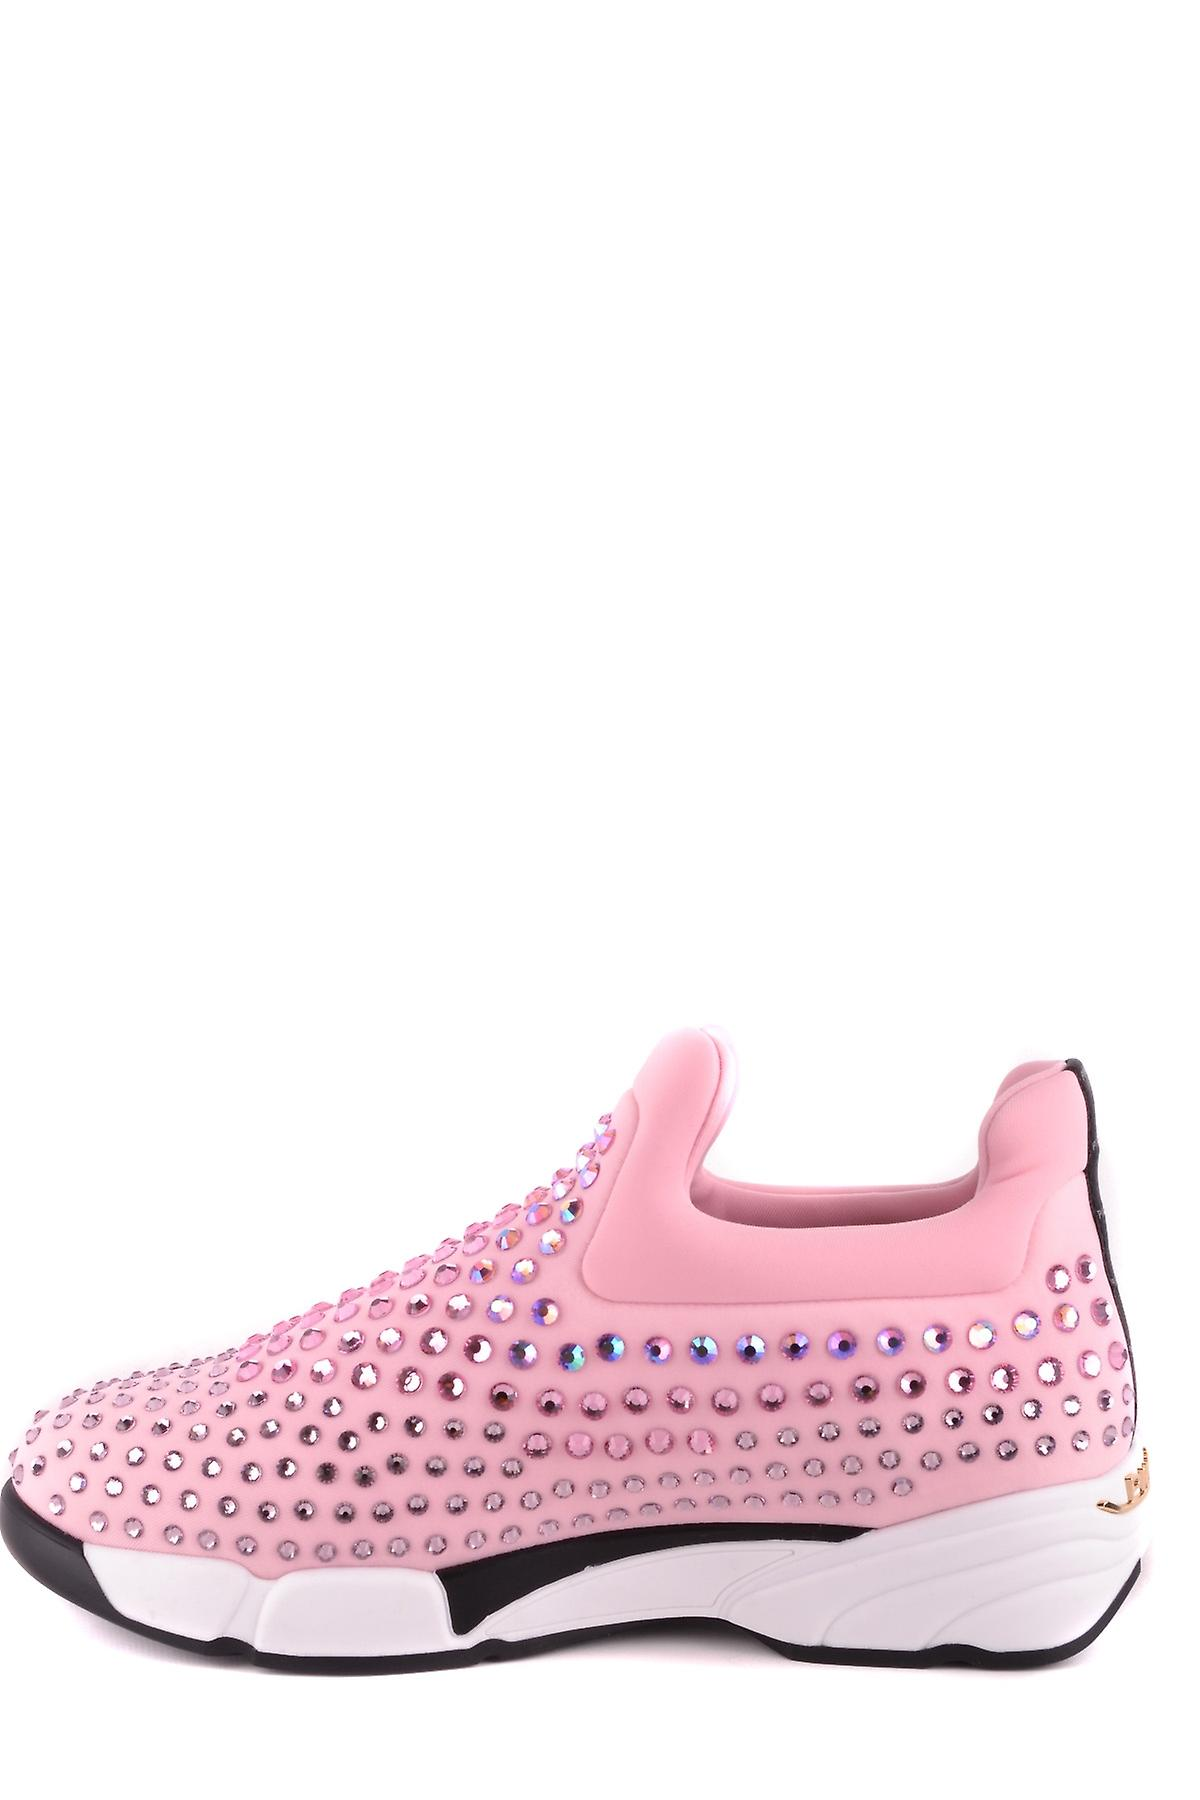 Pinko Ezbc056080 Women's Pink Nylon Slip On Sneakers